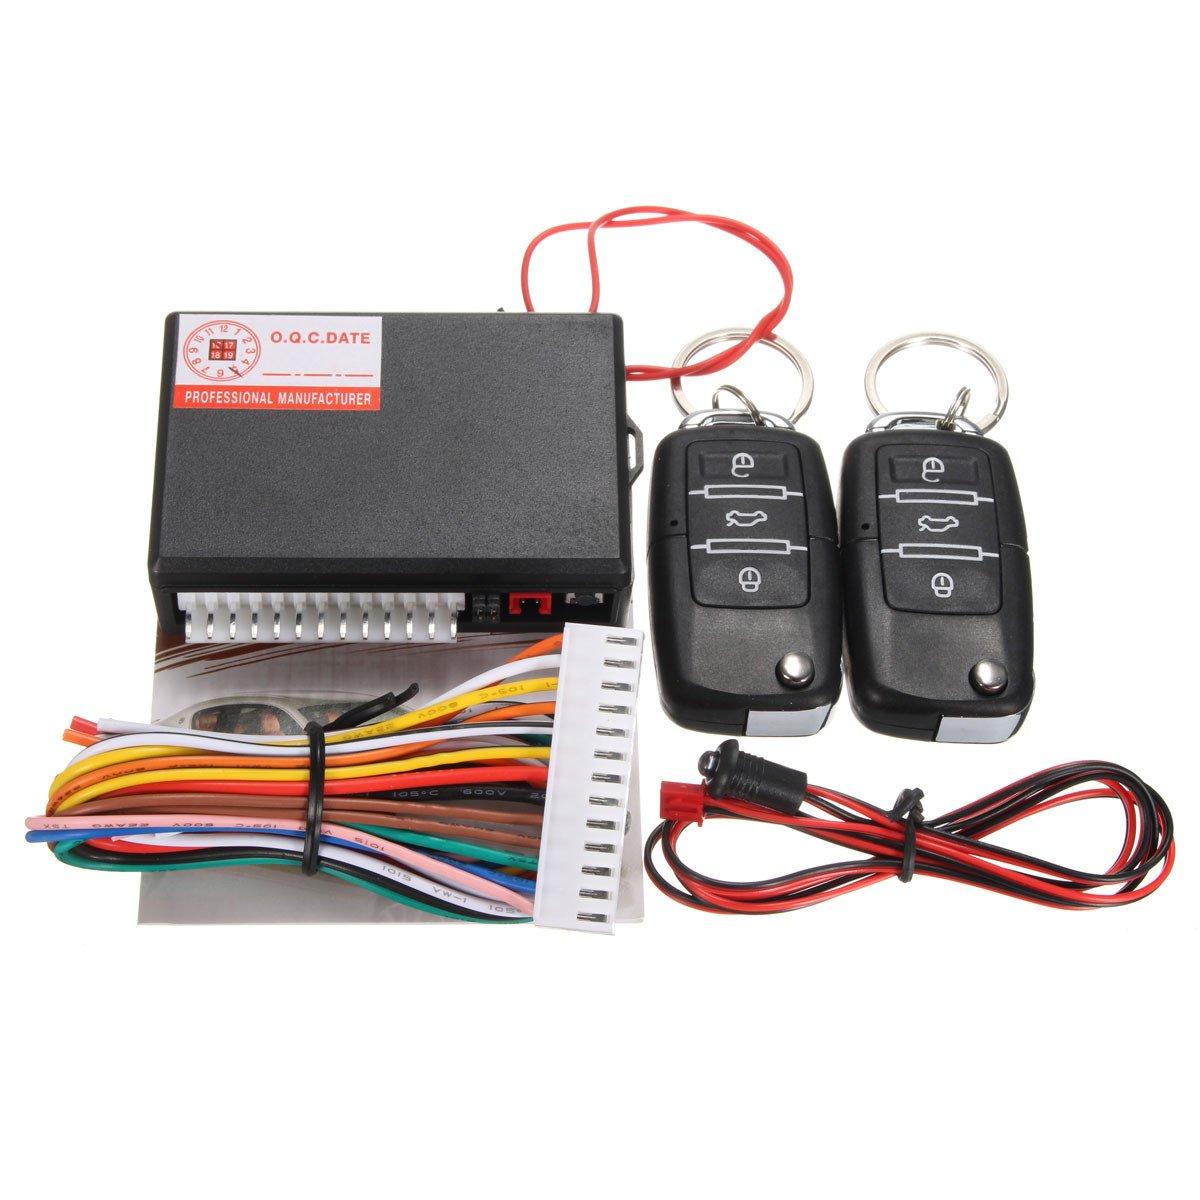 Professional Car Central Locking Lock System Flip Key Hyundai Getz Wiring Diagram Generic Remote Control Kit Door Keyless Entry Universal One Piece